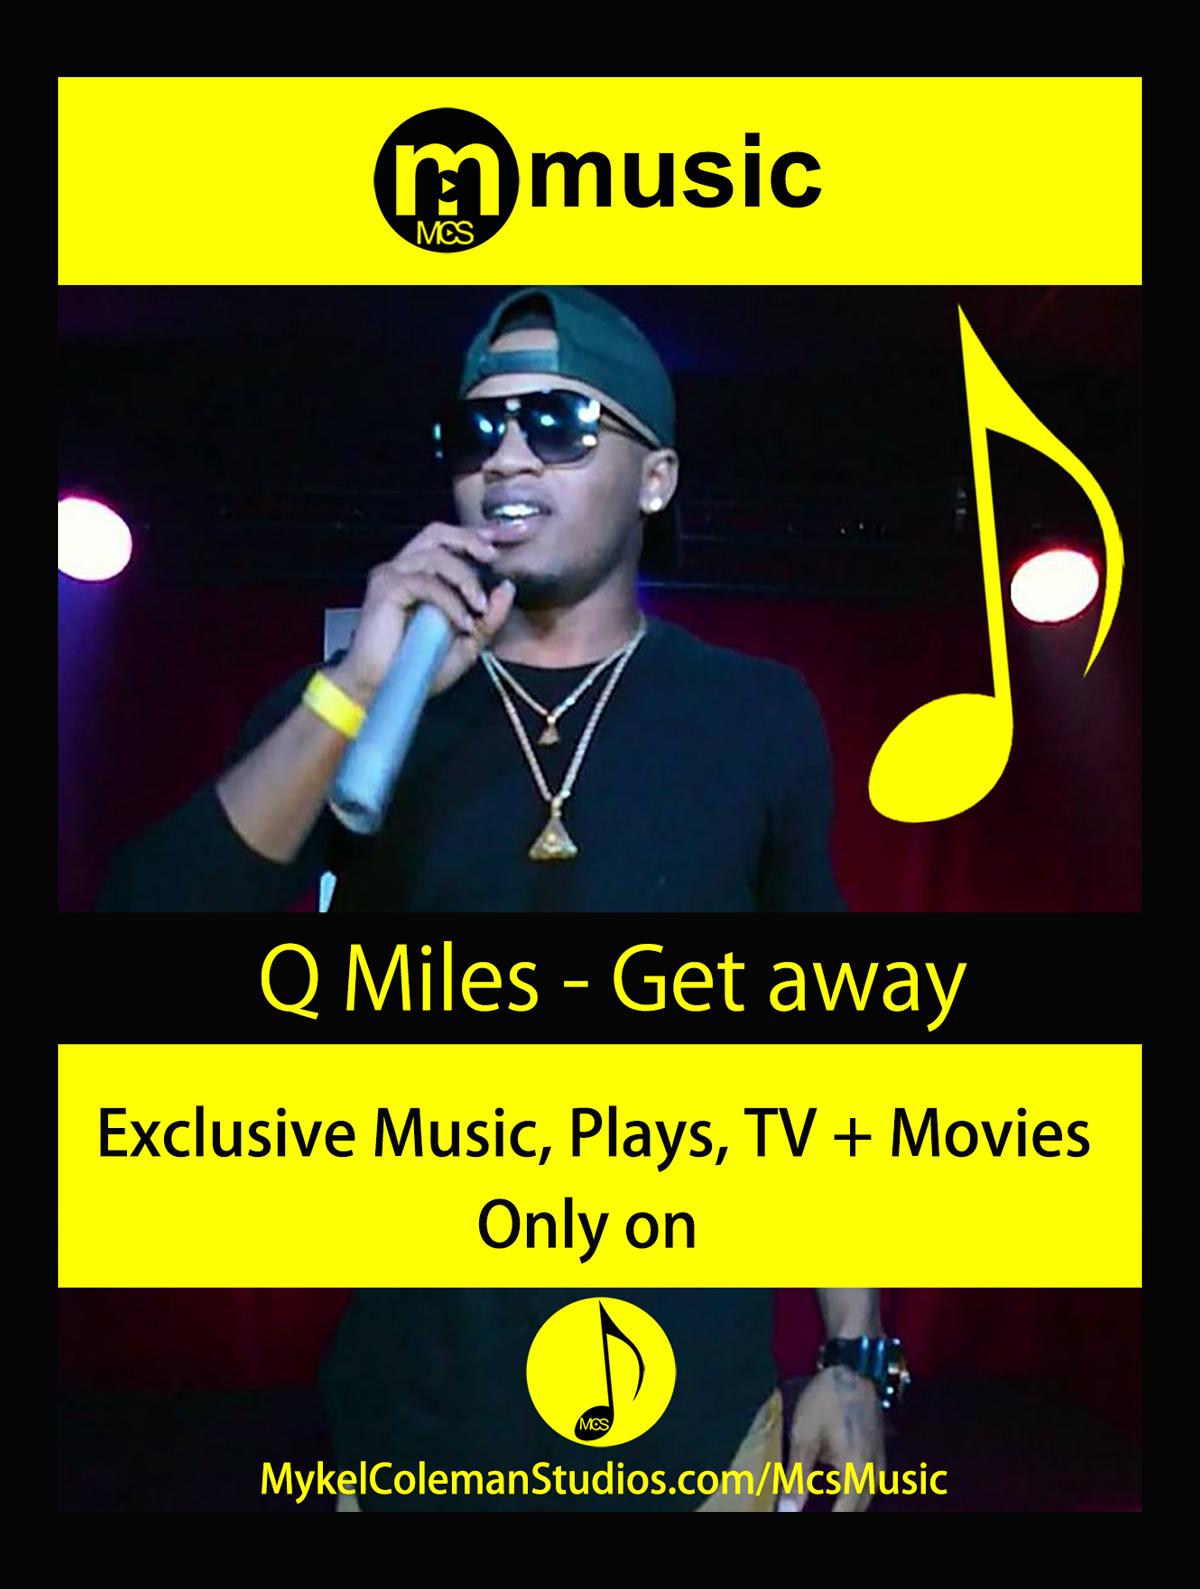 QMiles MCS Music Billboard